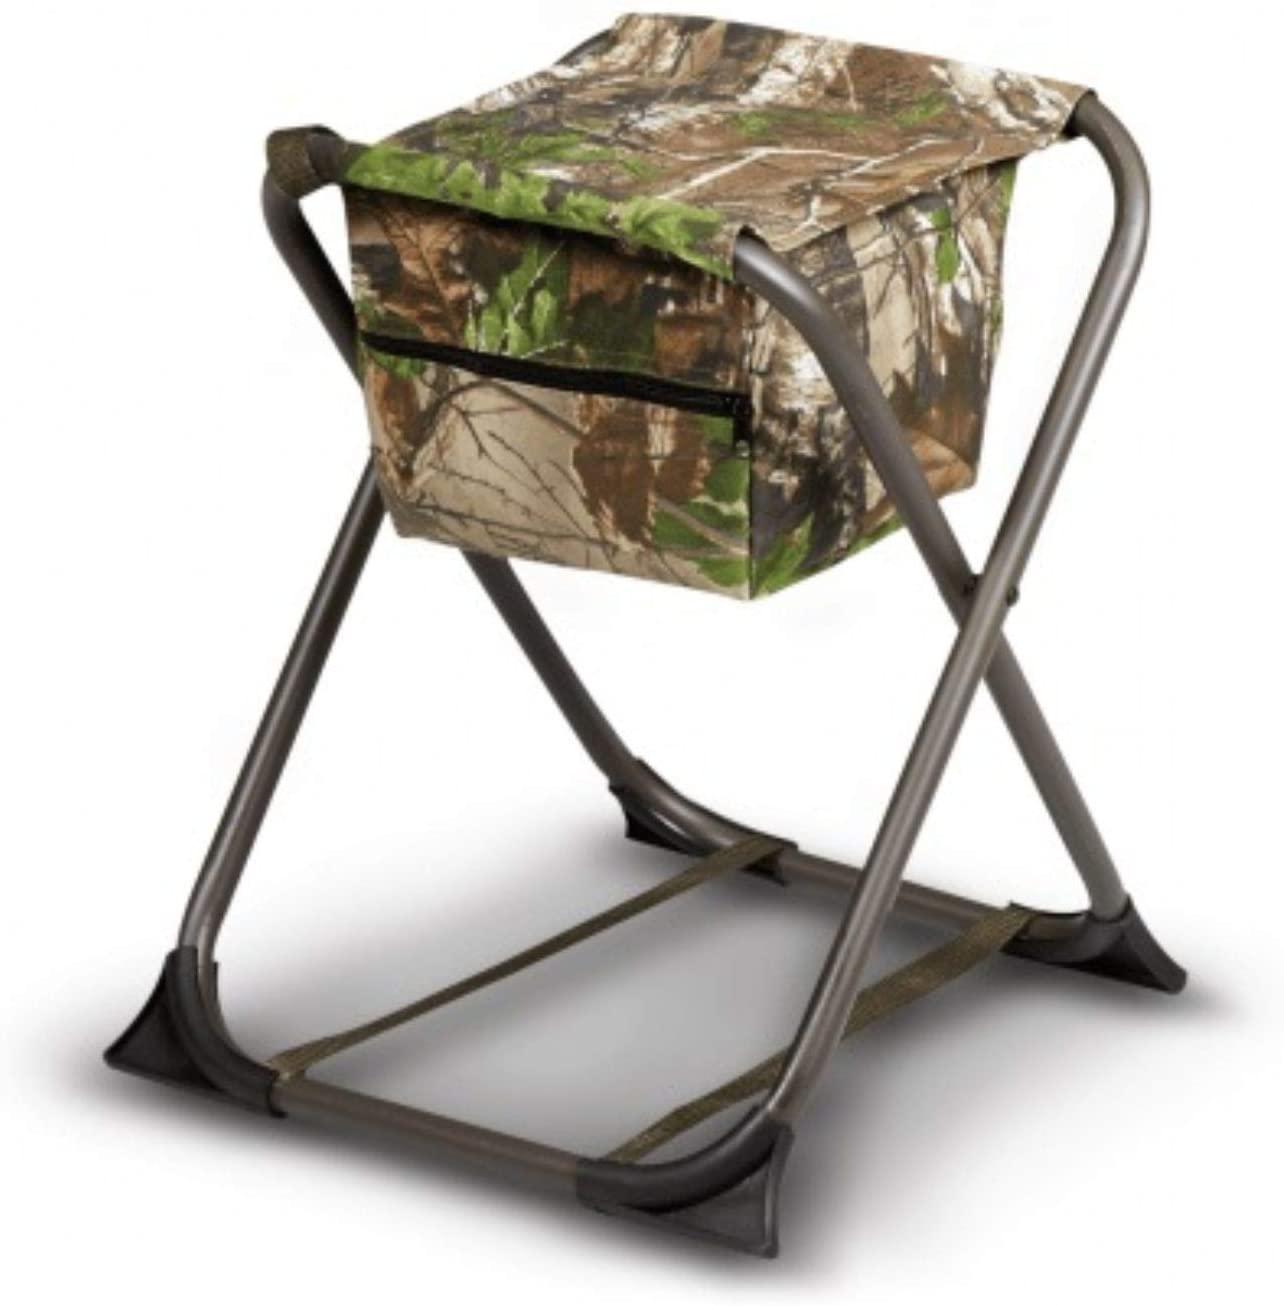 Hunters Specialties 100151 Dove Stool W/O Back - Realtree Edge, Multi, One Size